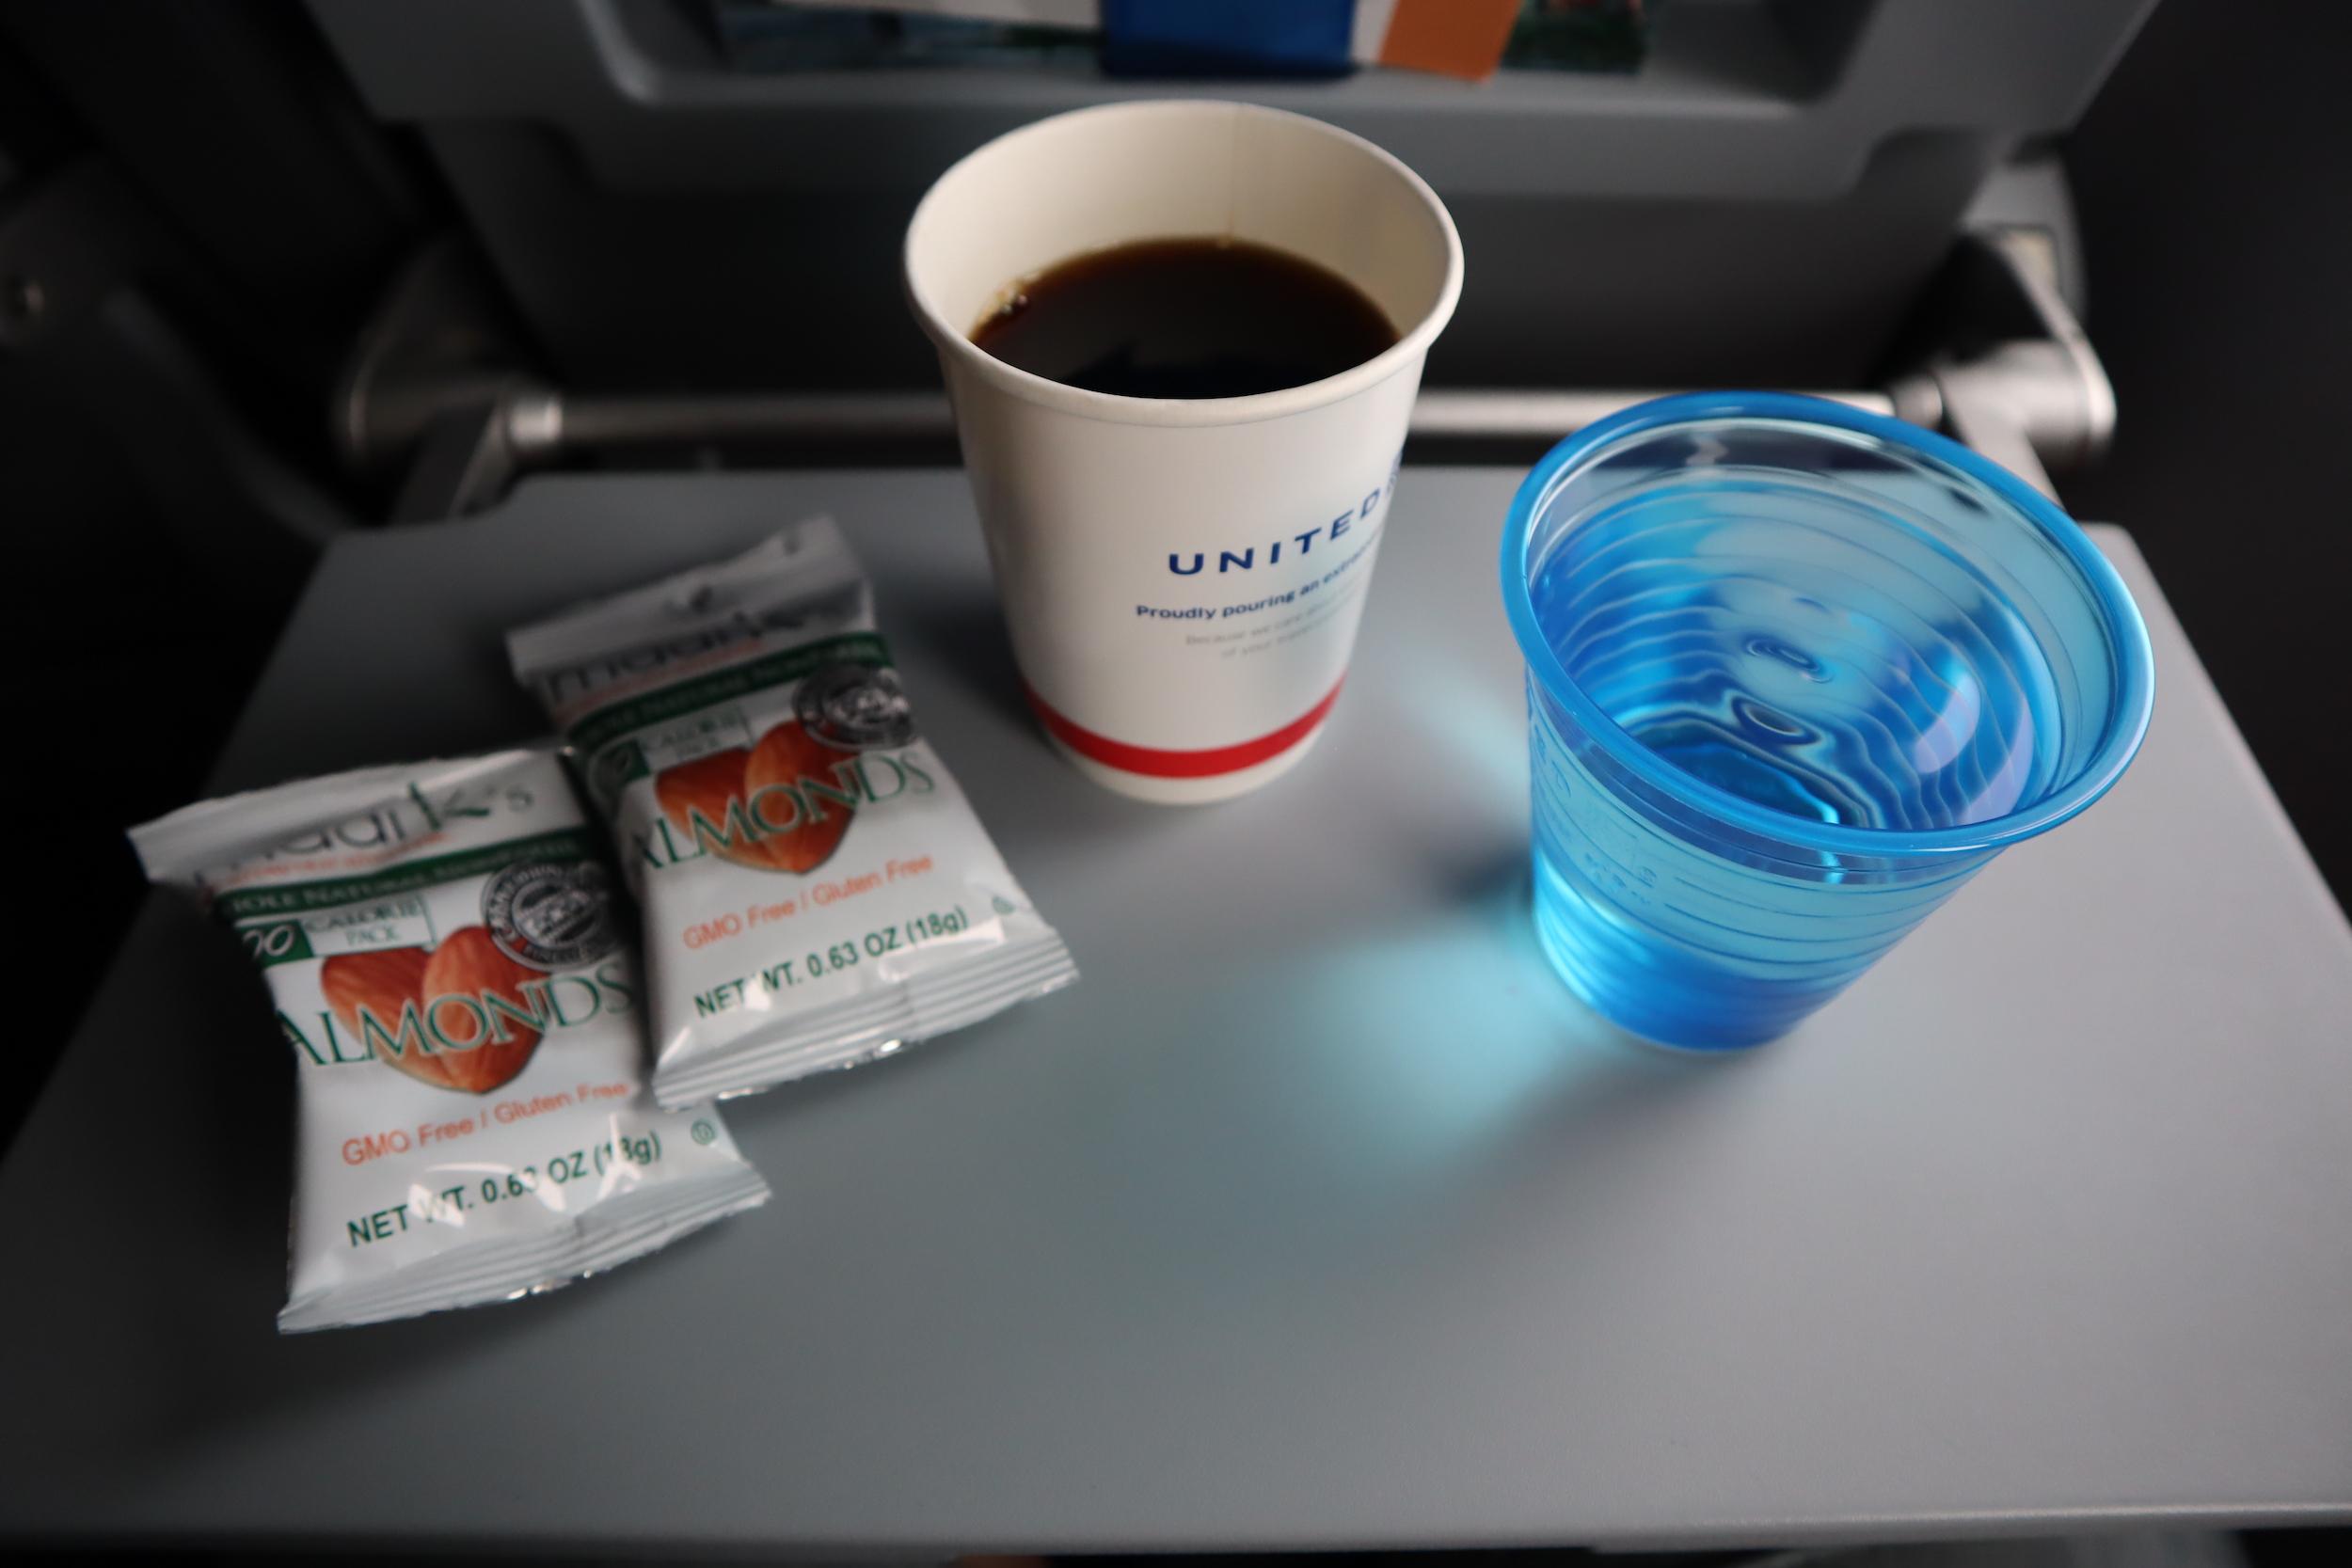 United Flight 155 – In-flight snack and drinks